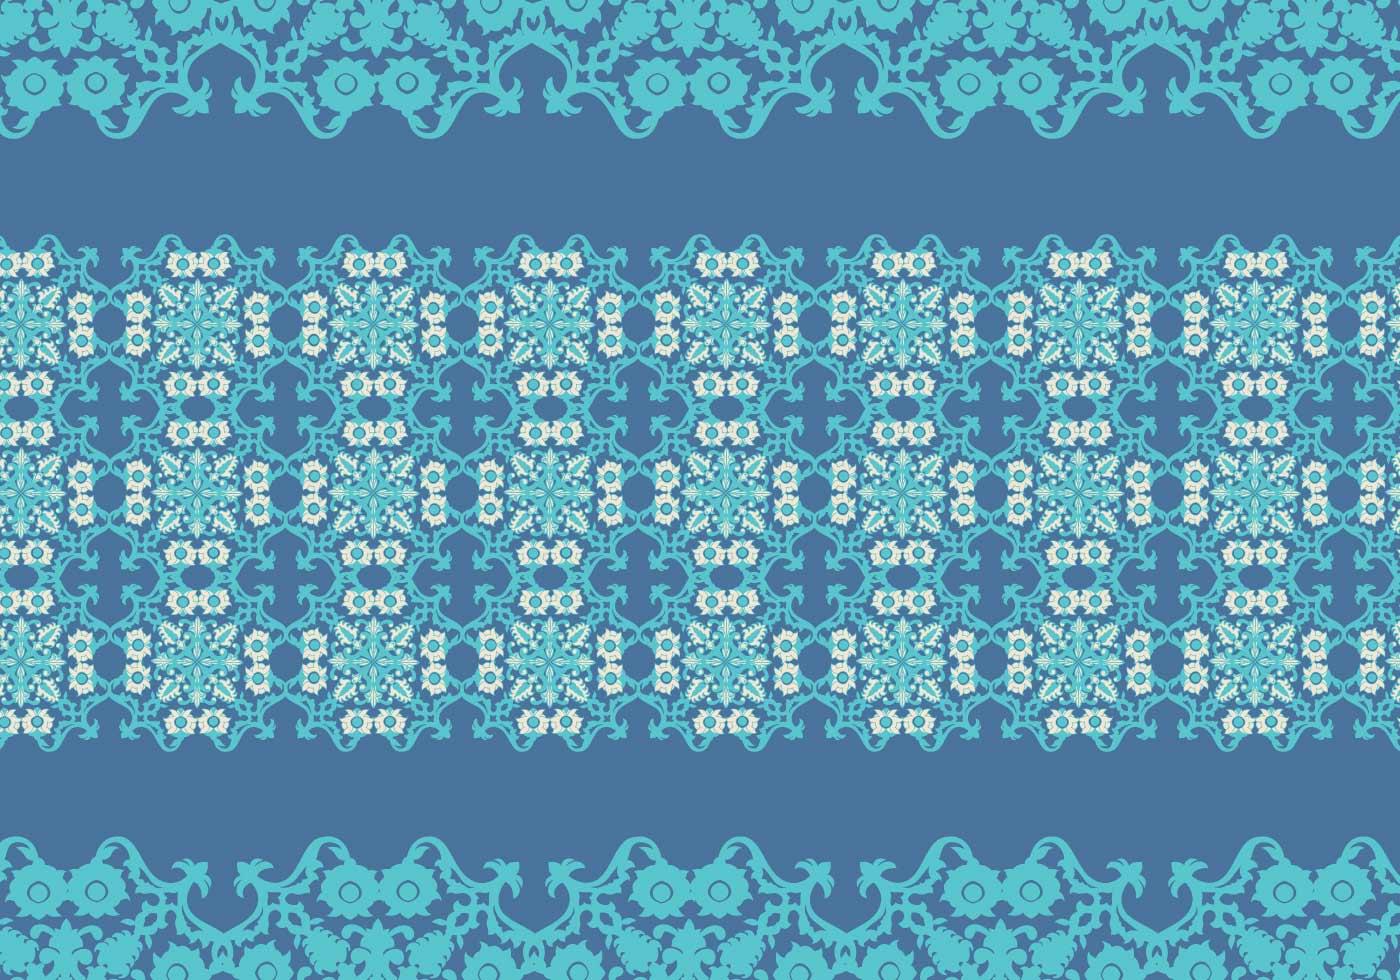 Portuguese Tile Pattern Vector - Download Free Vector Art, Stock ...